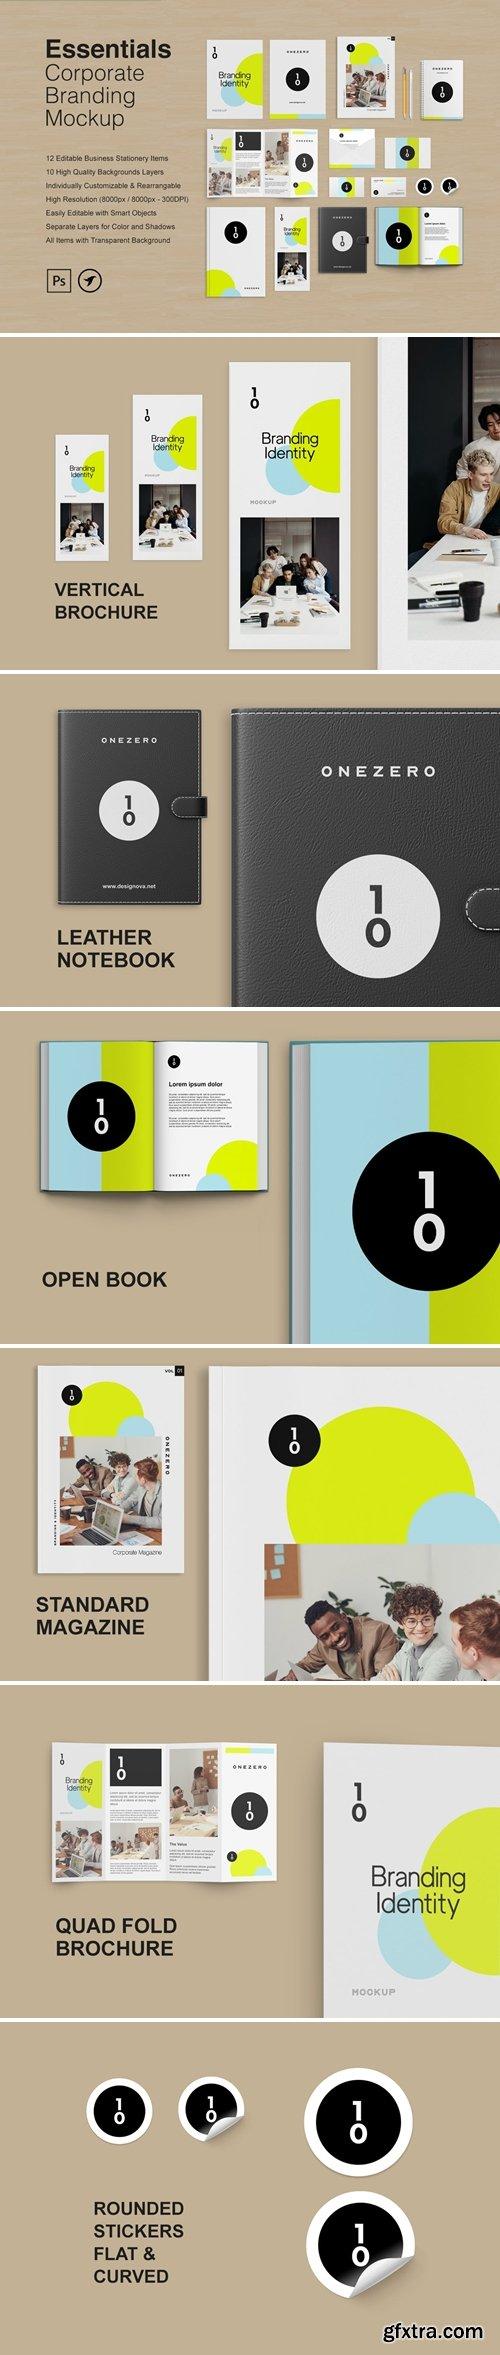 Essentials - Corporate Stationery Branding Mockup